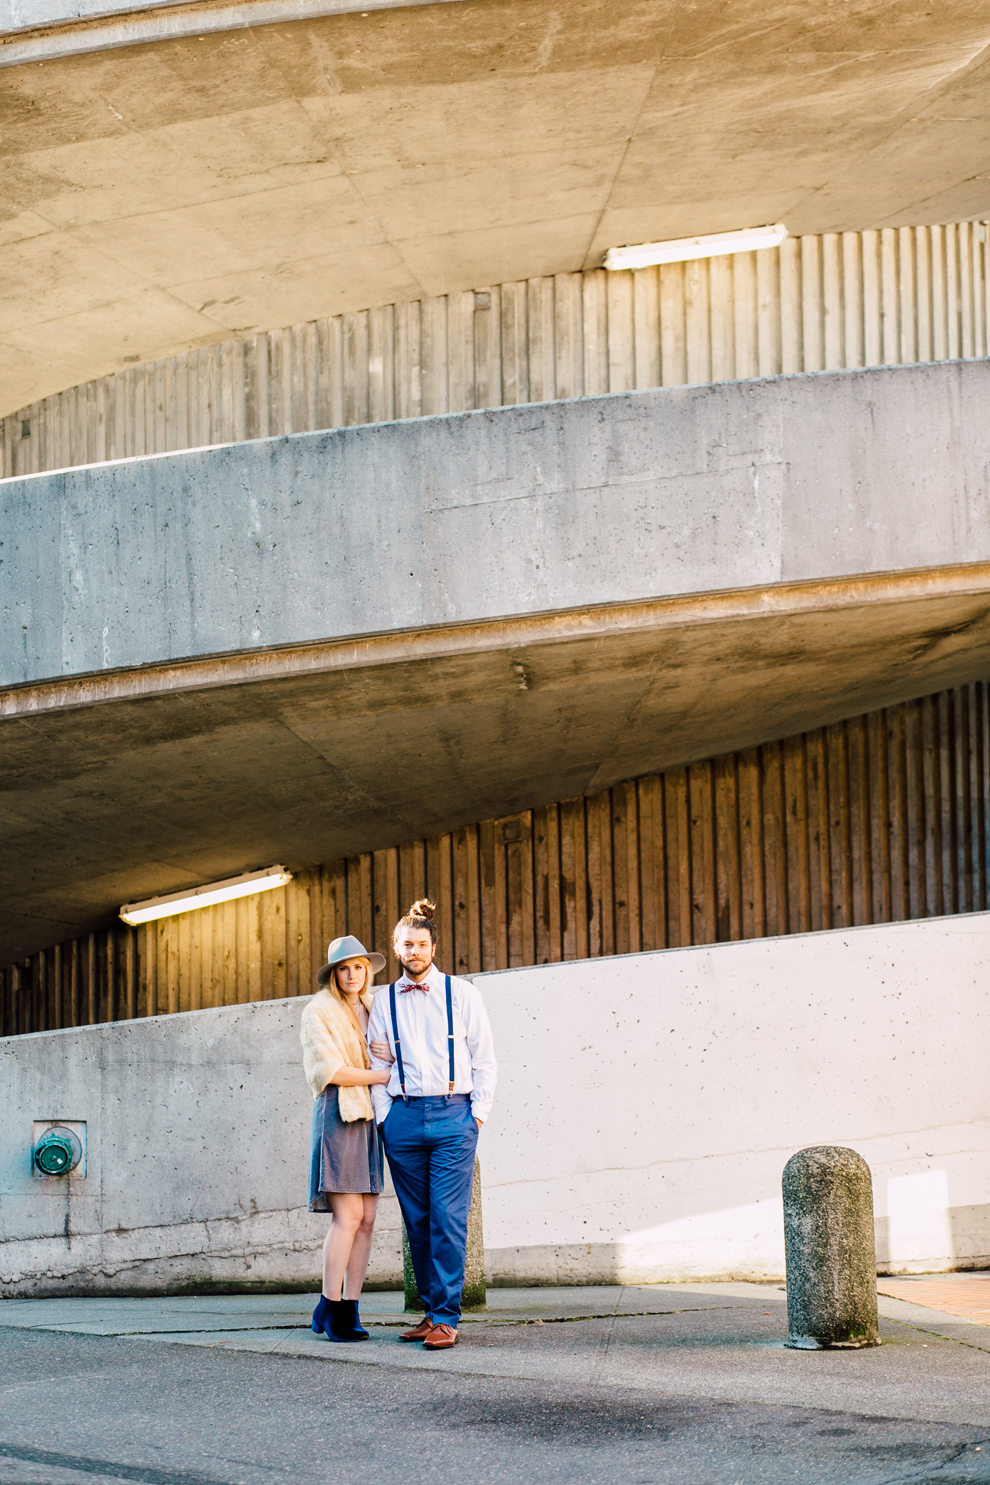 010-bellingham-parkade-elopement-styled-katheryn-moran-photography.jpg